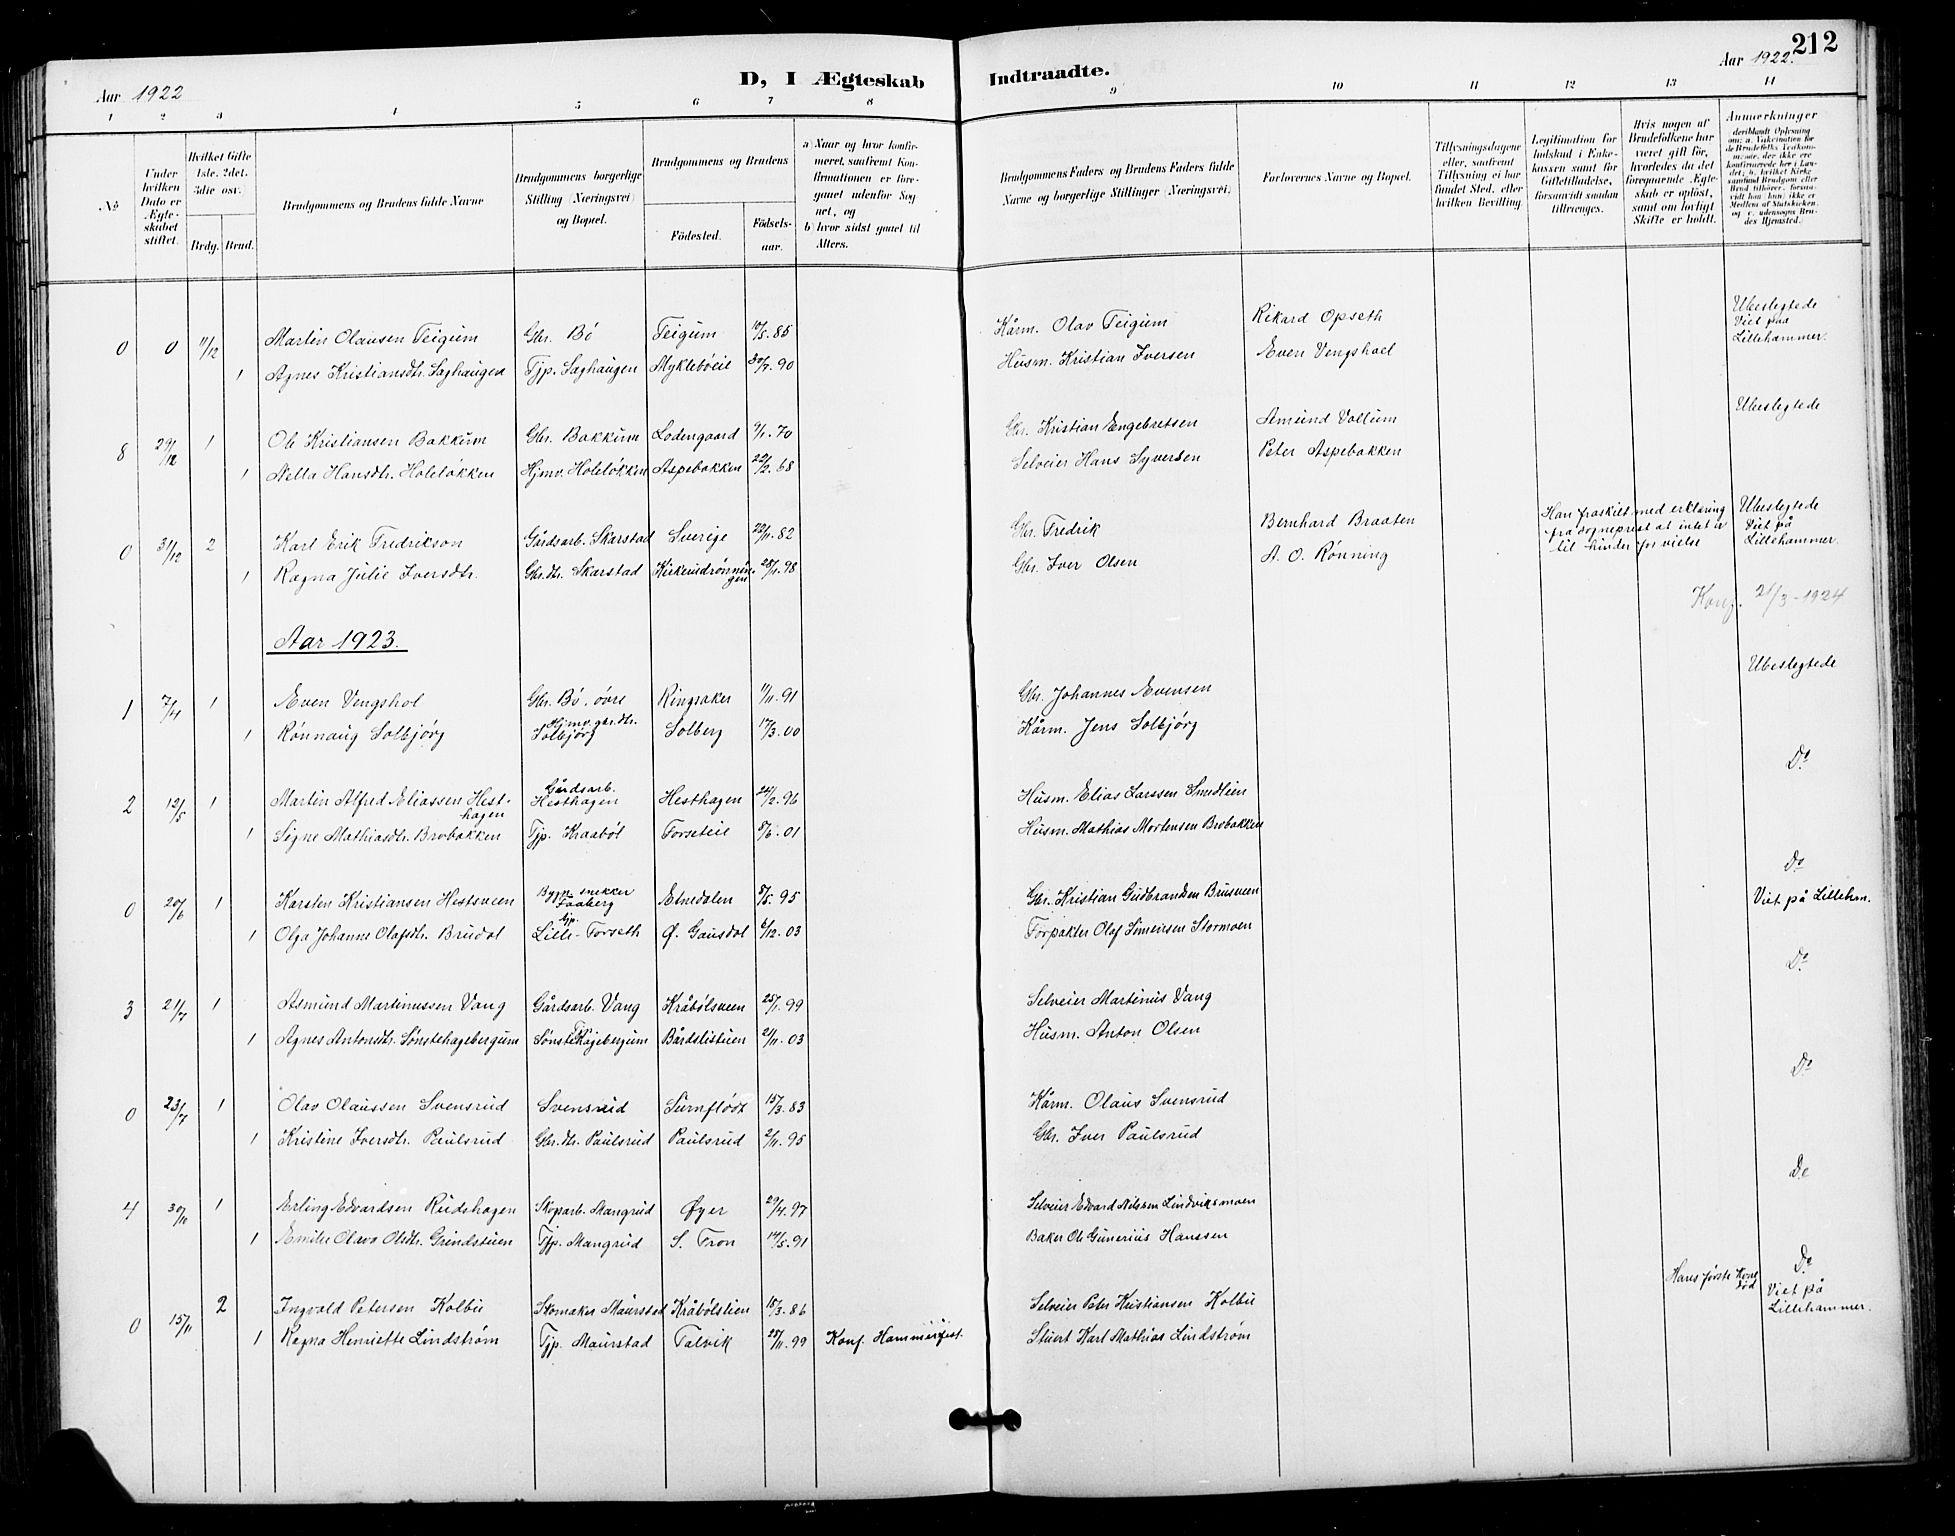 SAH, Vestre Gausdal prestekontor, Klokkerbok nr. 3, 1896-1925, s. 212